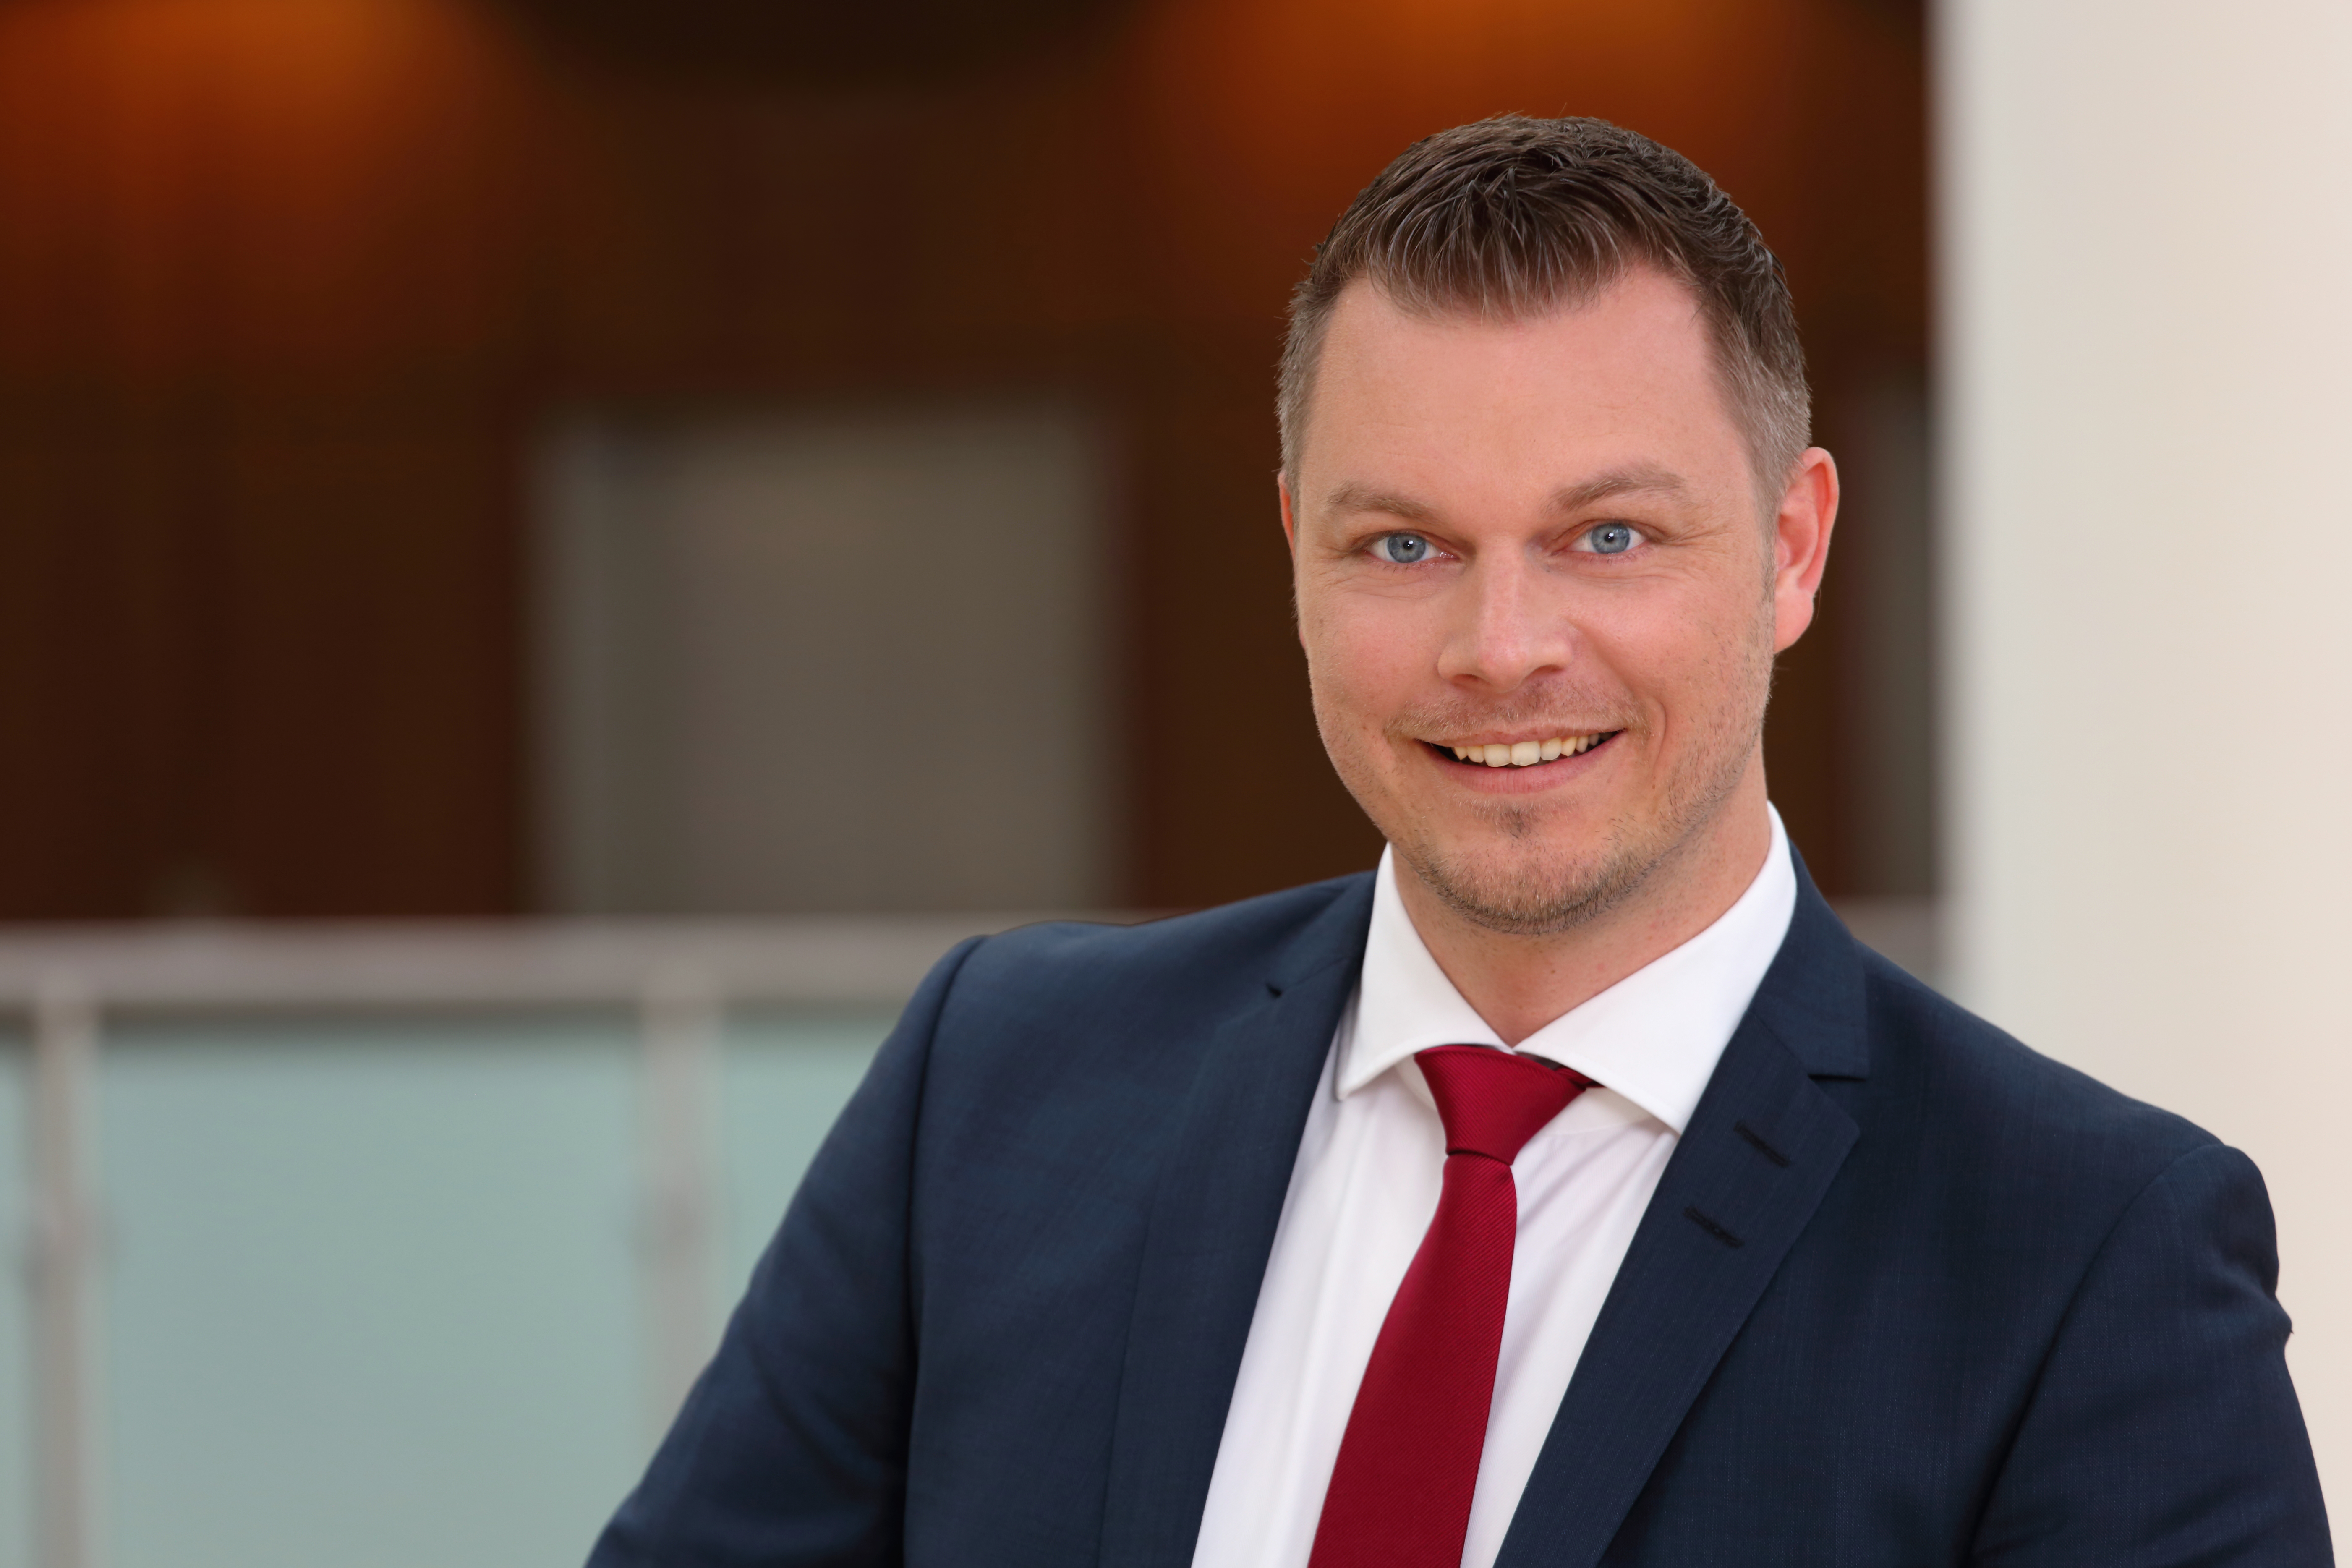 Rechtsanwalt Versicherungsrecht Und Arbeitsrecht In Frankfurt Am Main